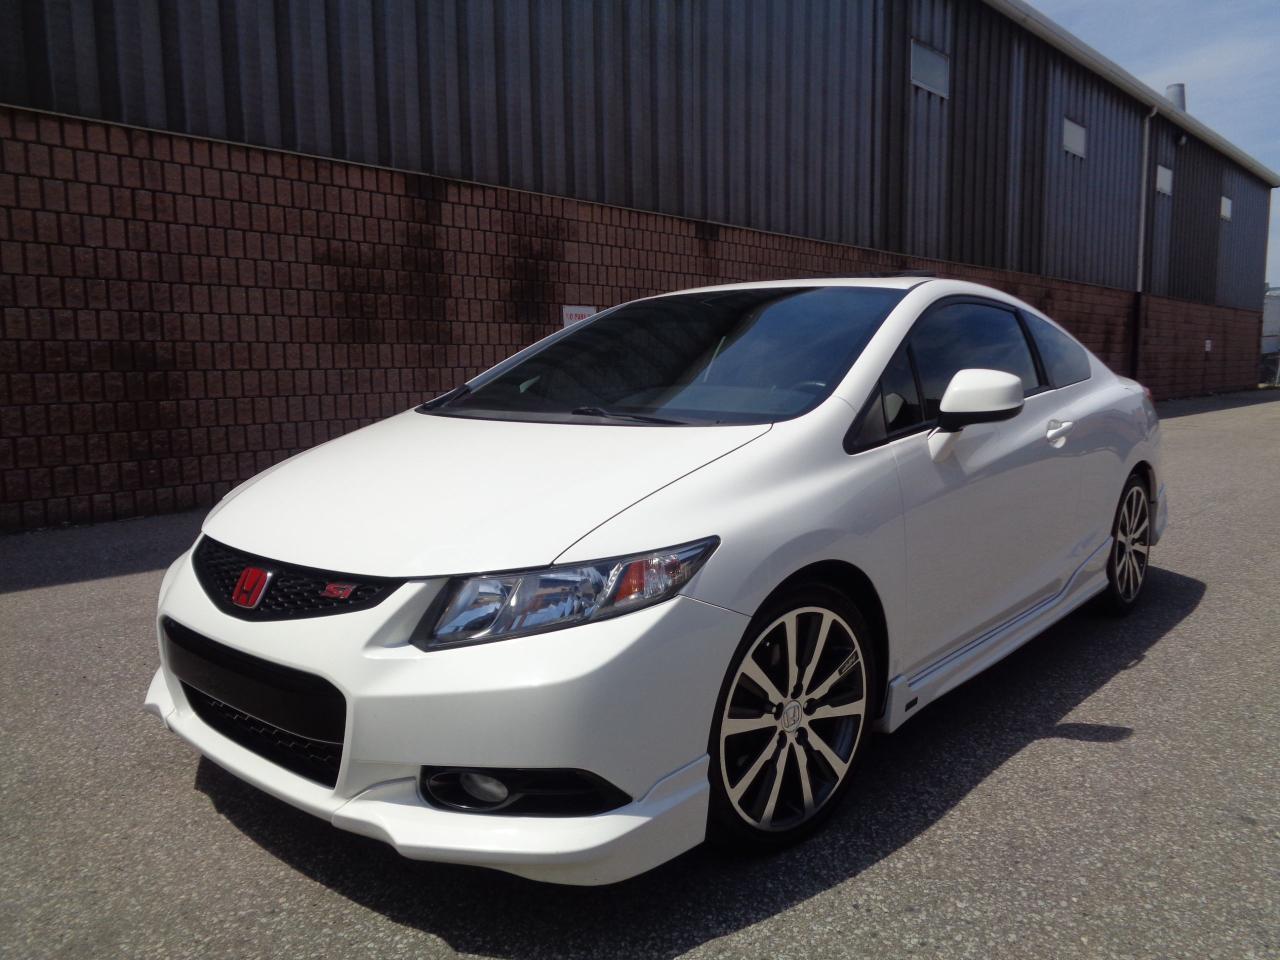 Photo of White 2013 Honda Civic